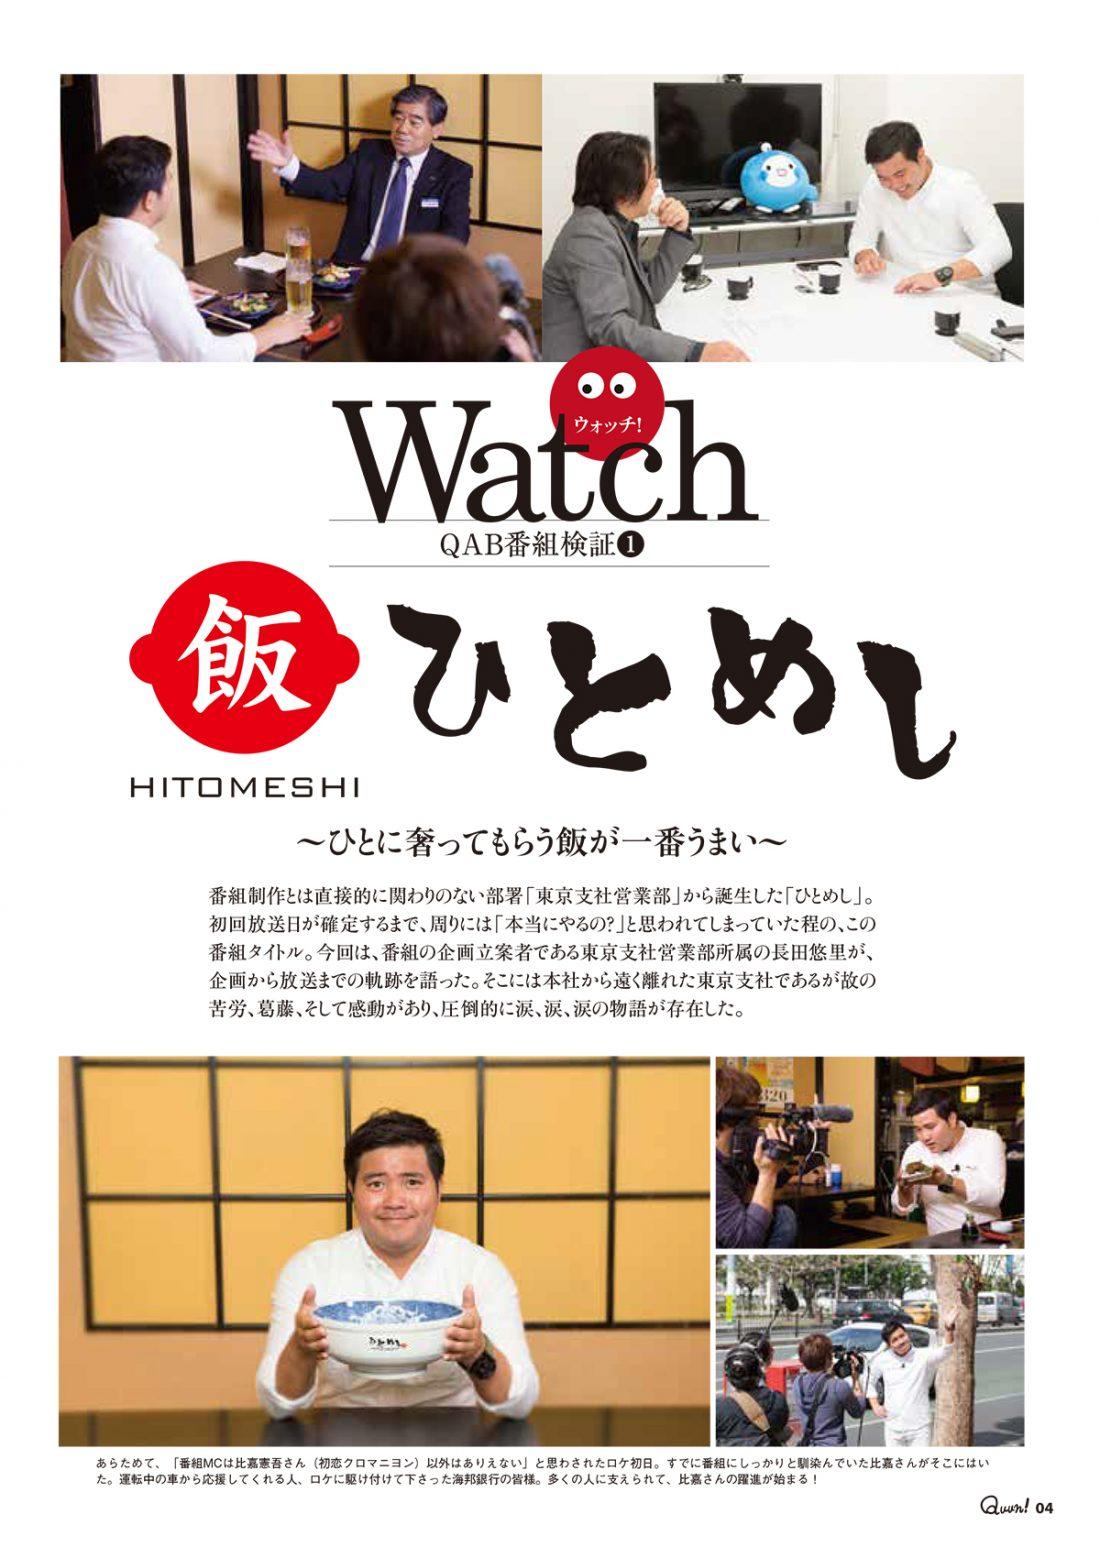 https://www.qab.co.jp/qgoro/wp-content/uploads/quun_0306-1100x1558.jpg